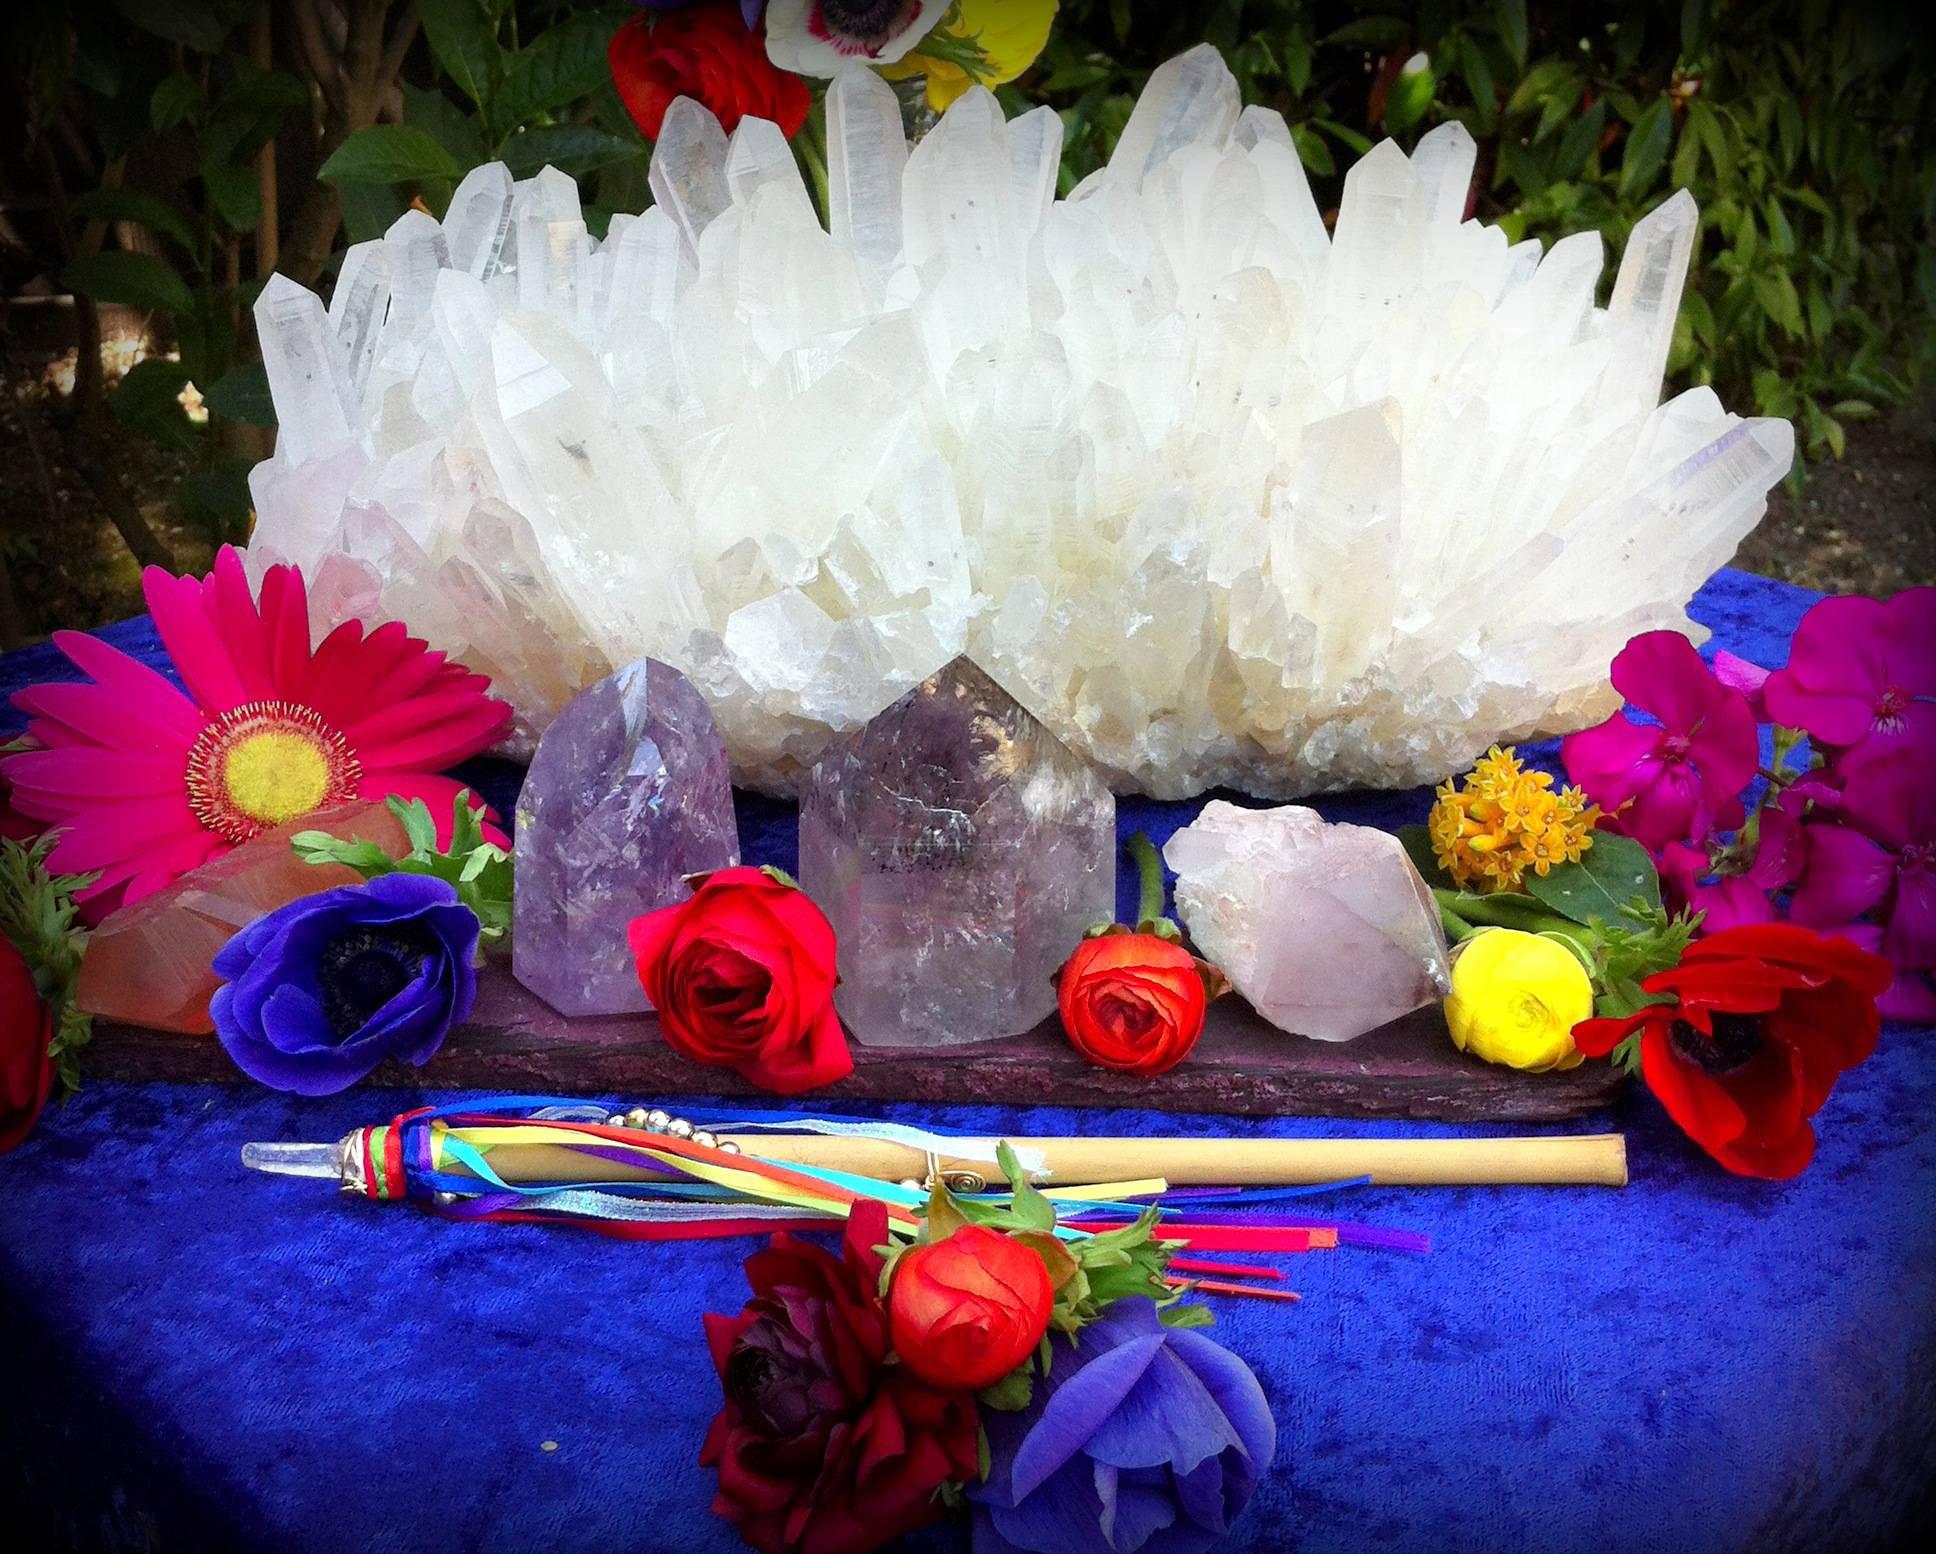 How to celebrate Beltane like a goddess!